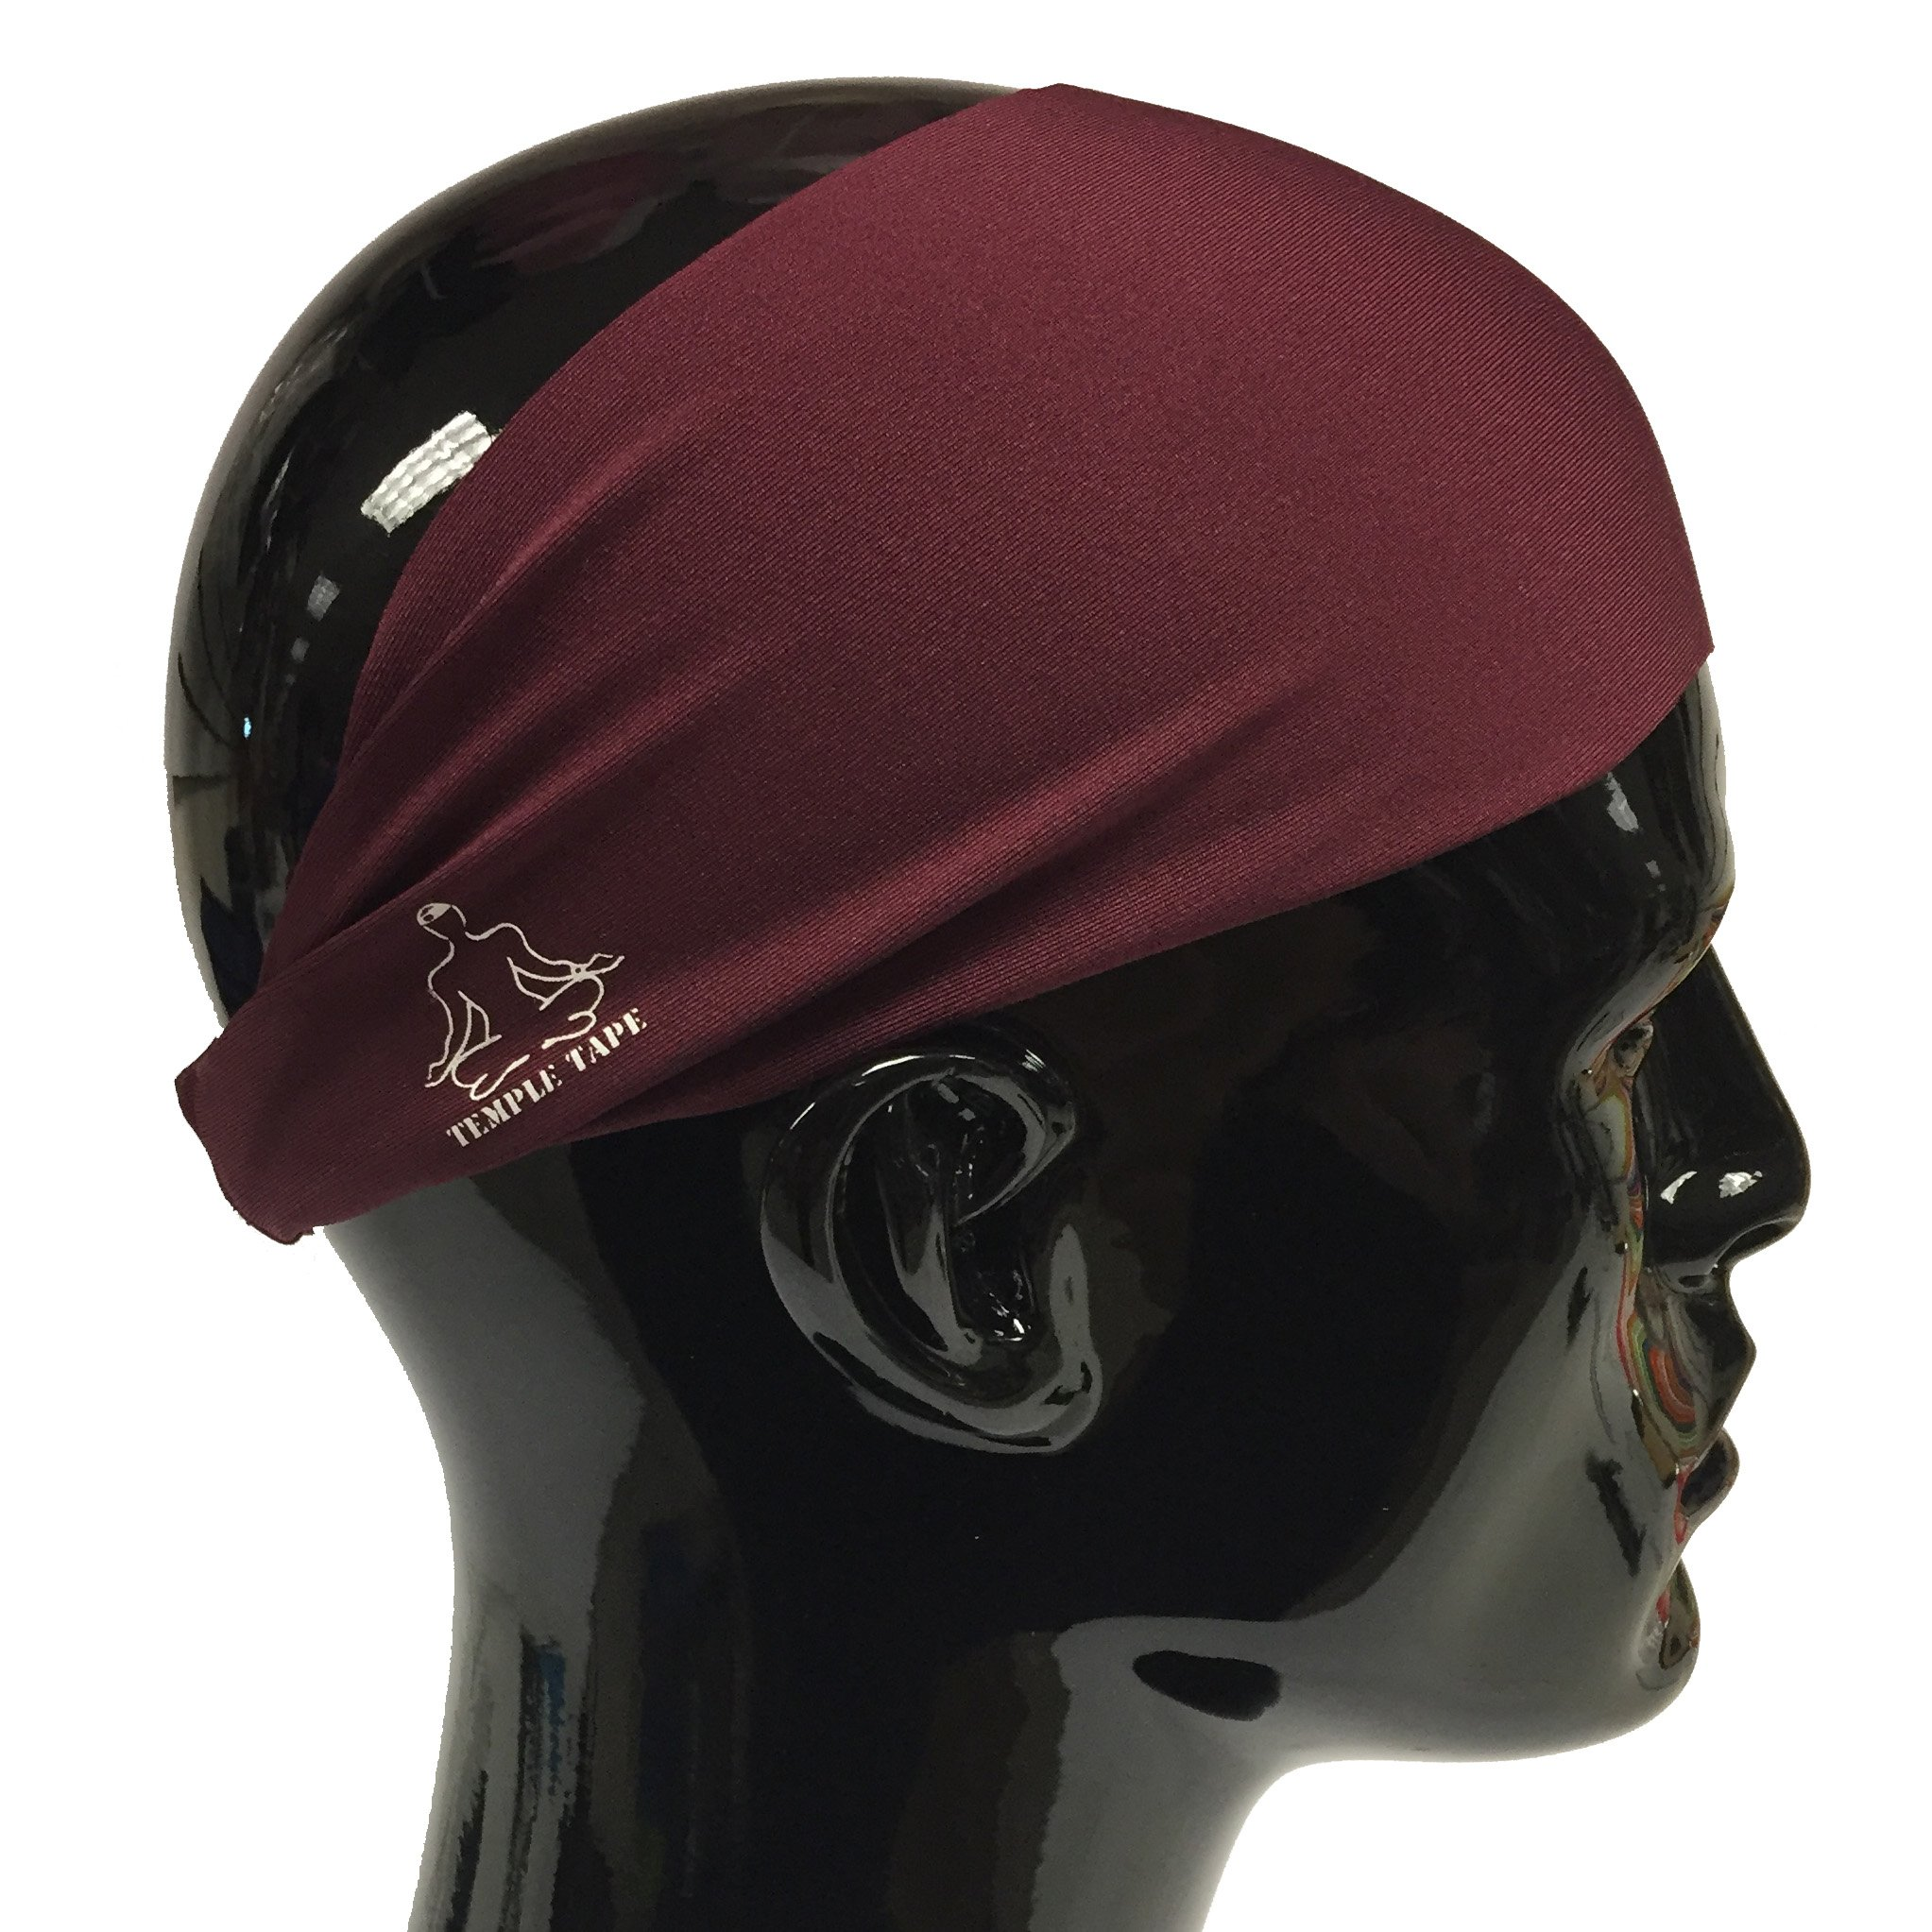 Temple Tape Headbands for Men and Women - Mens Sweatband & Sports Headband Moisture Wicking Workout Sweatbands for Running, Cross Training, Yoga and Bike Helmet Friendly - Burgundy